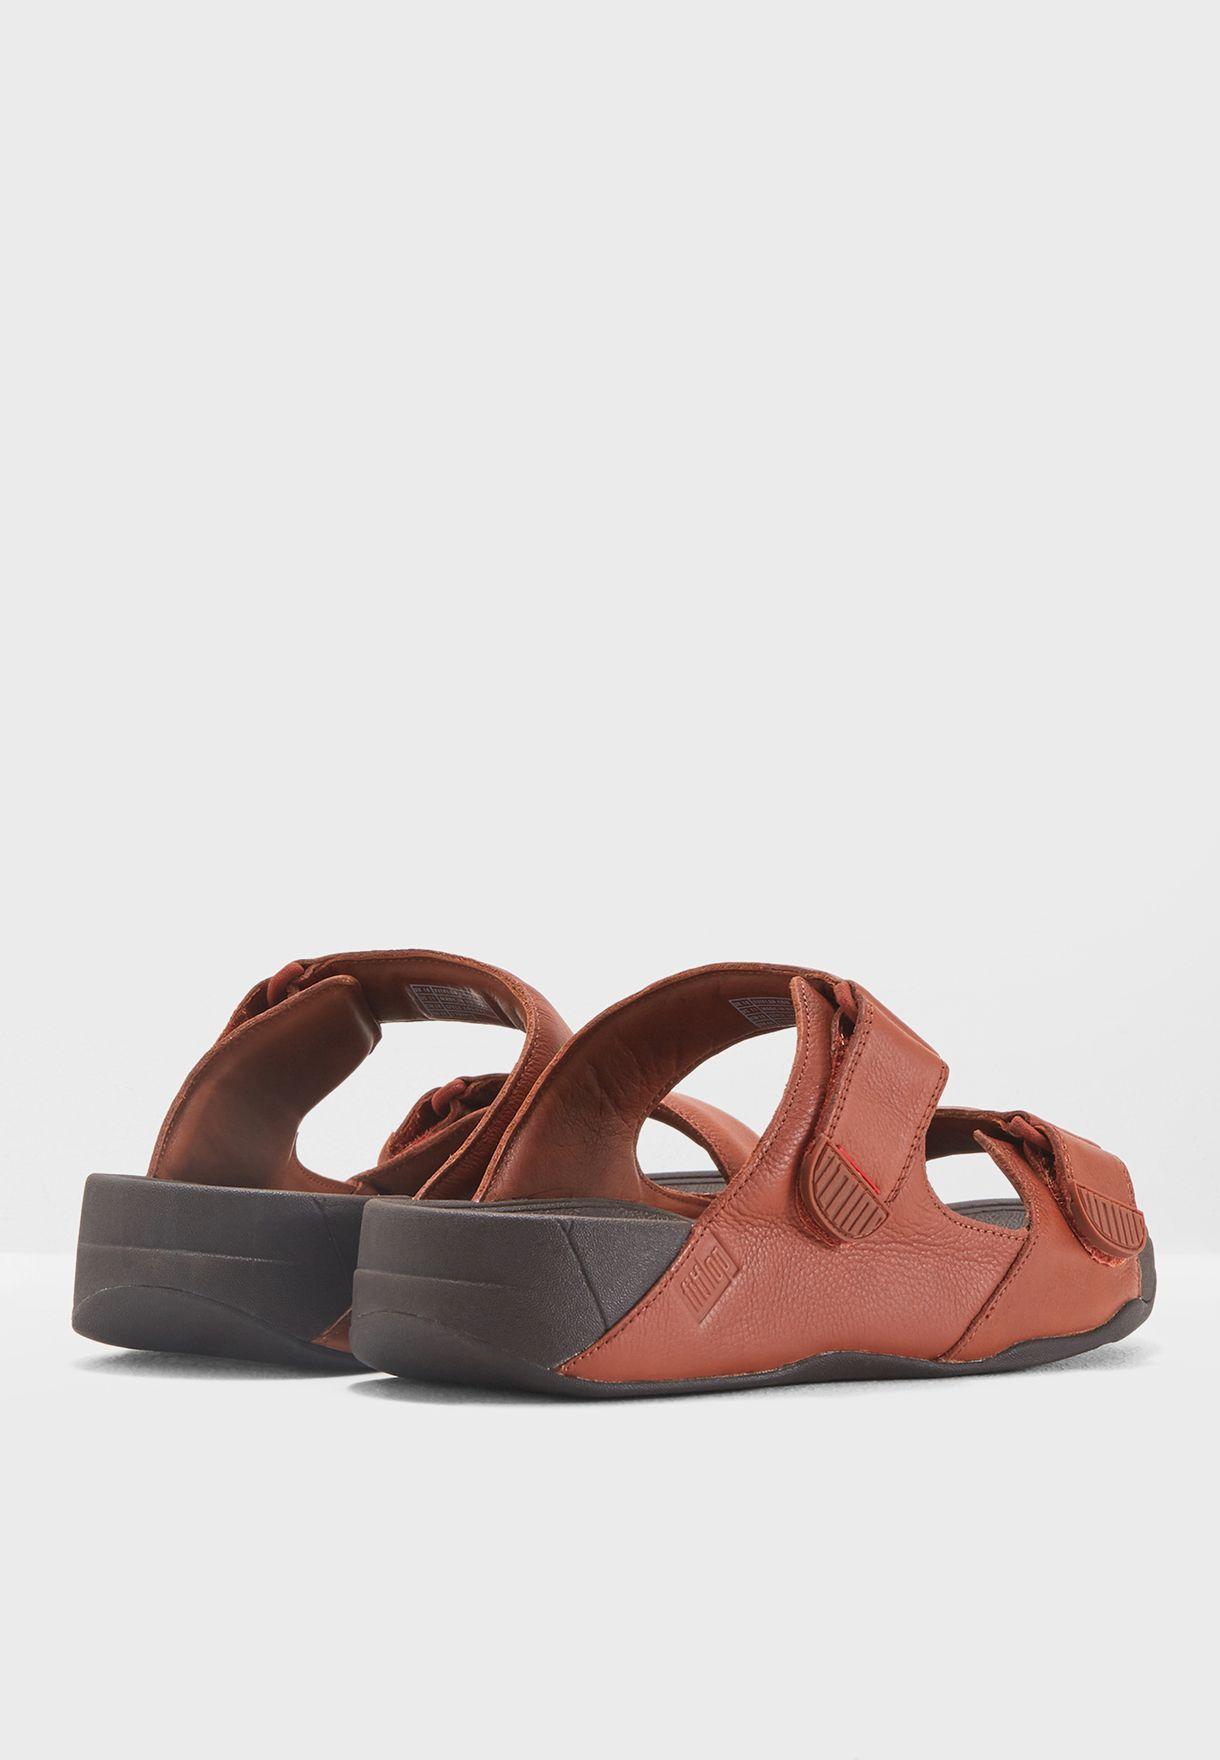 Gogh Moc Sandals